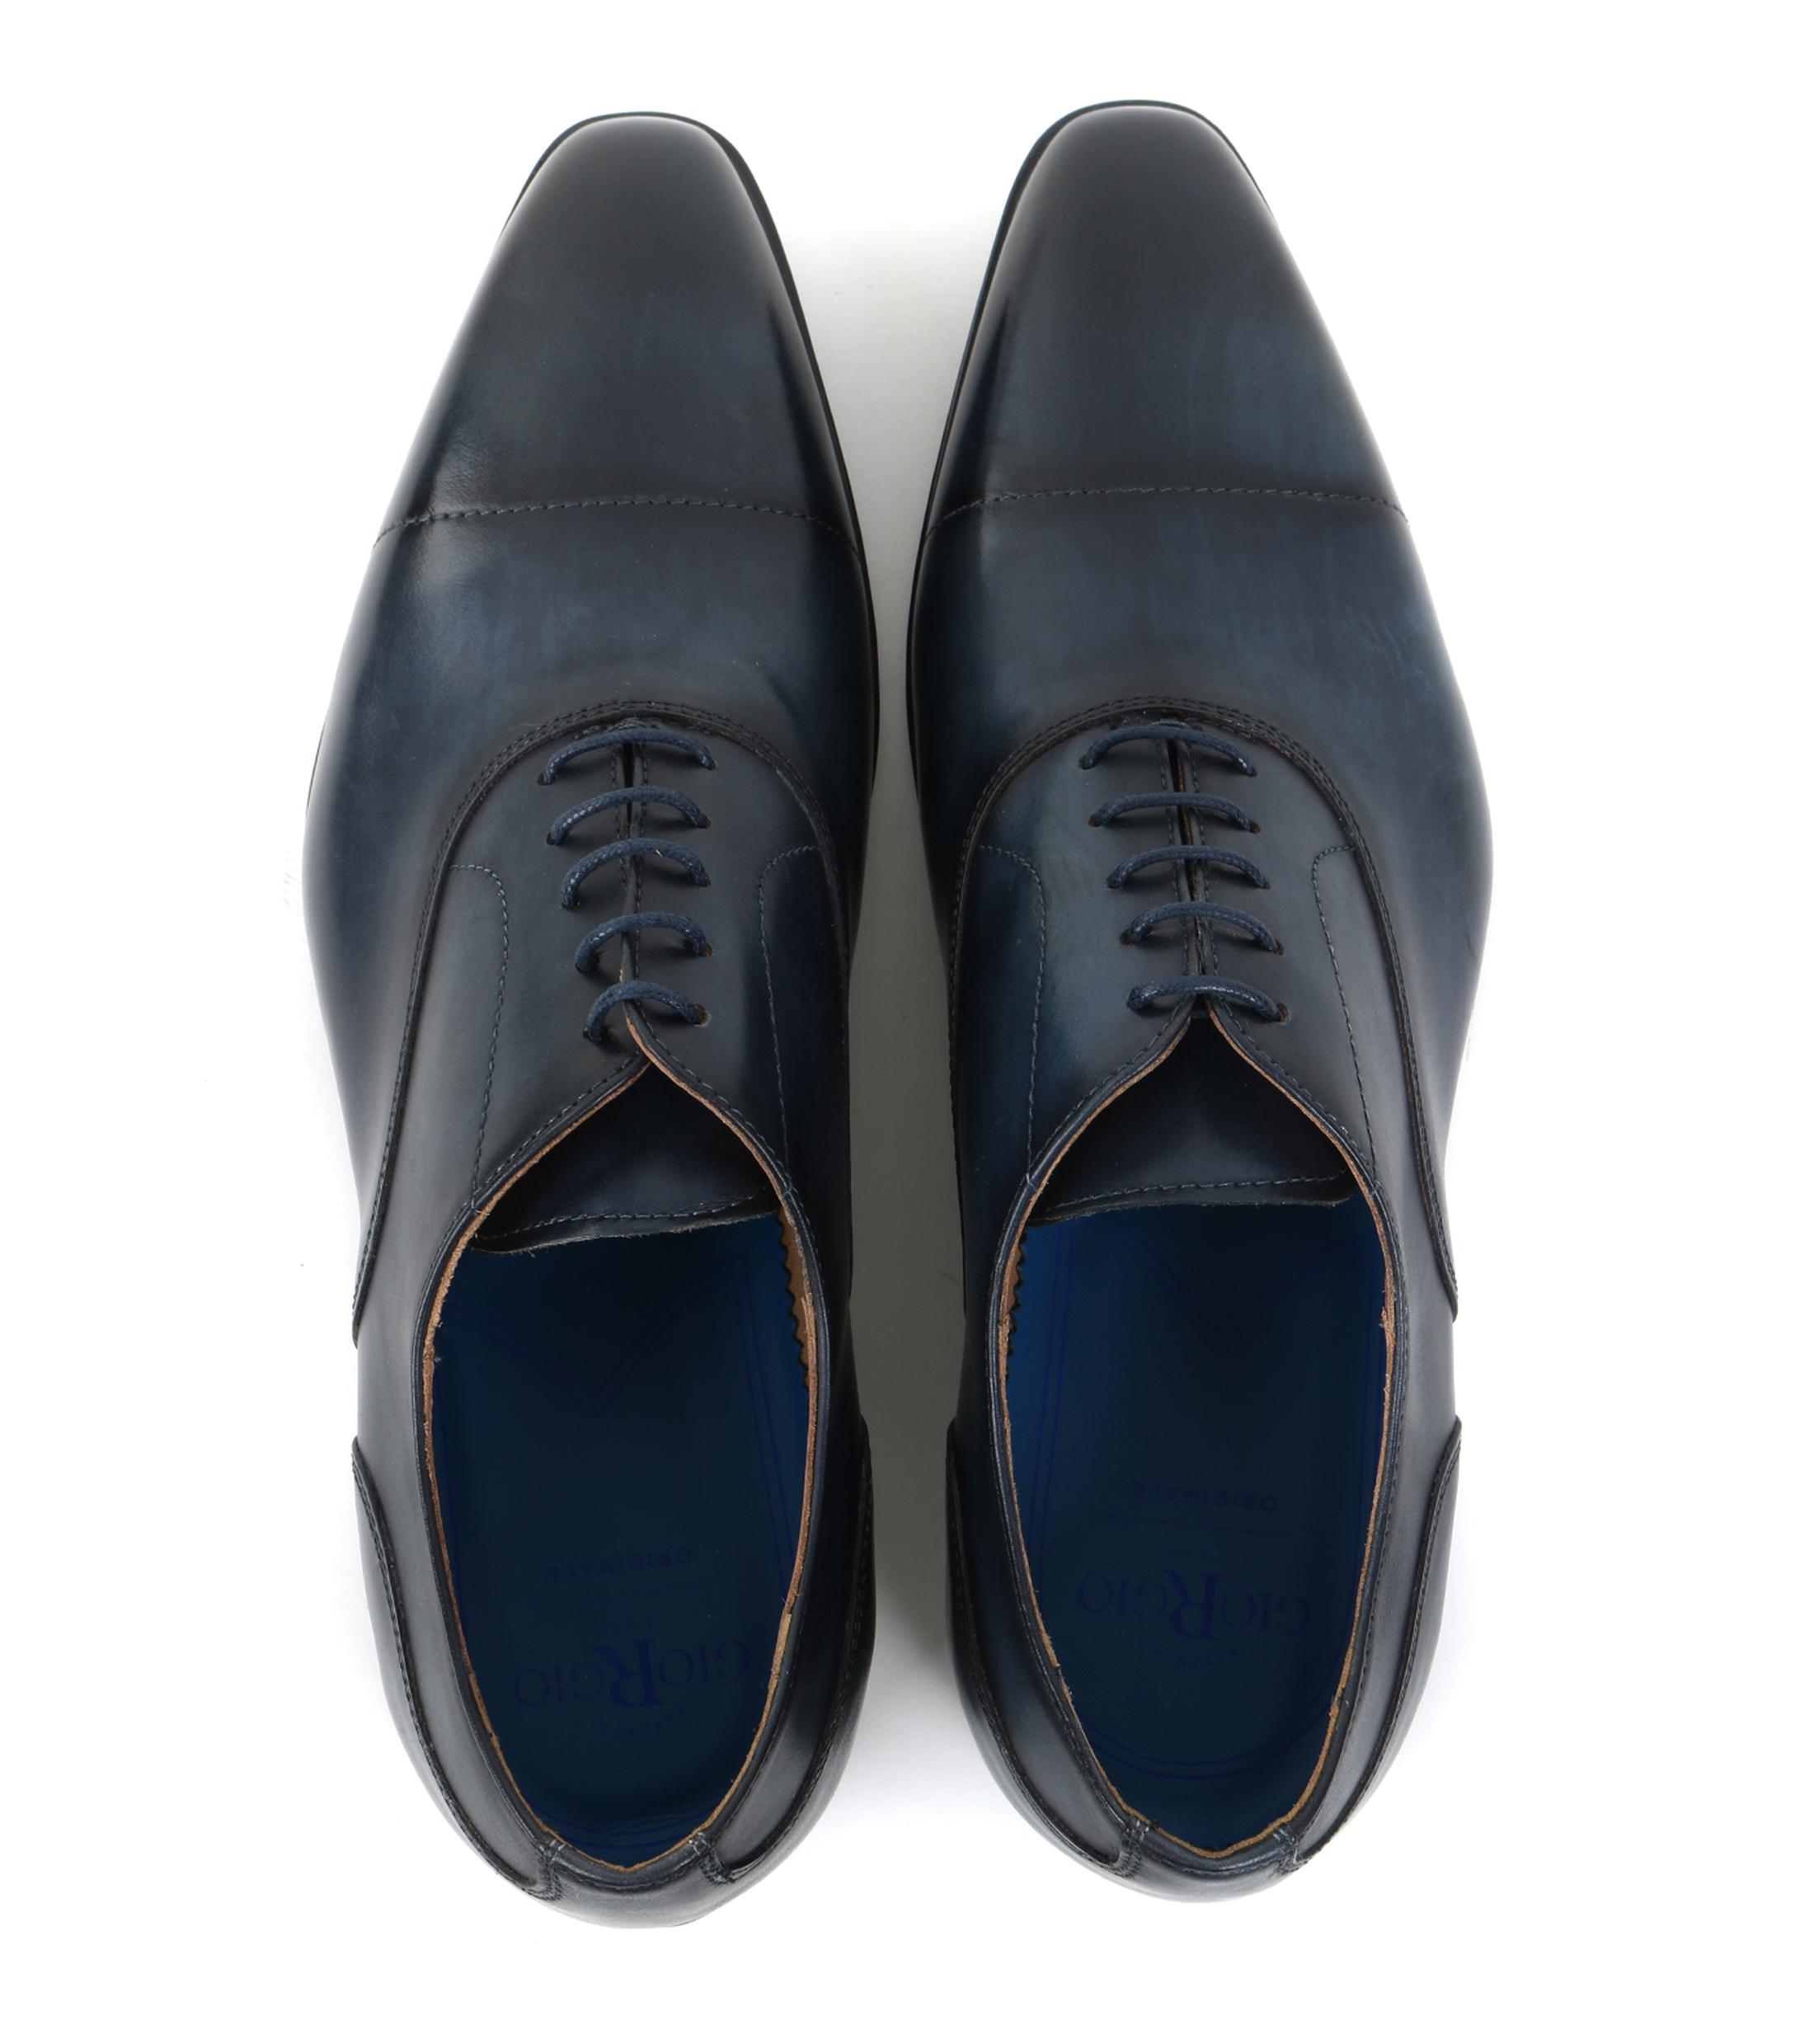 Giorgio Bellaria Noire De Chaussures En Dentelle fUmnI0WPl